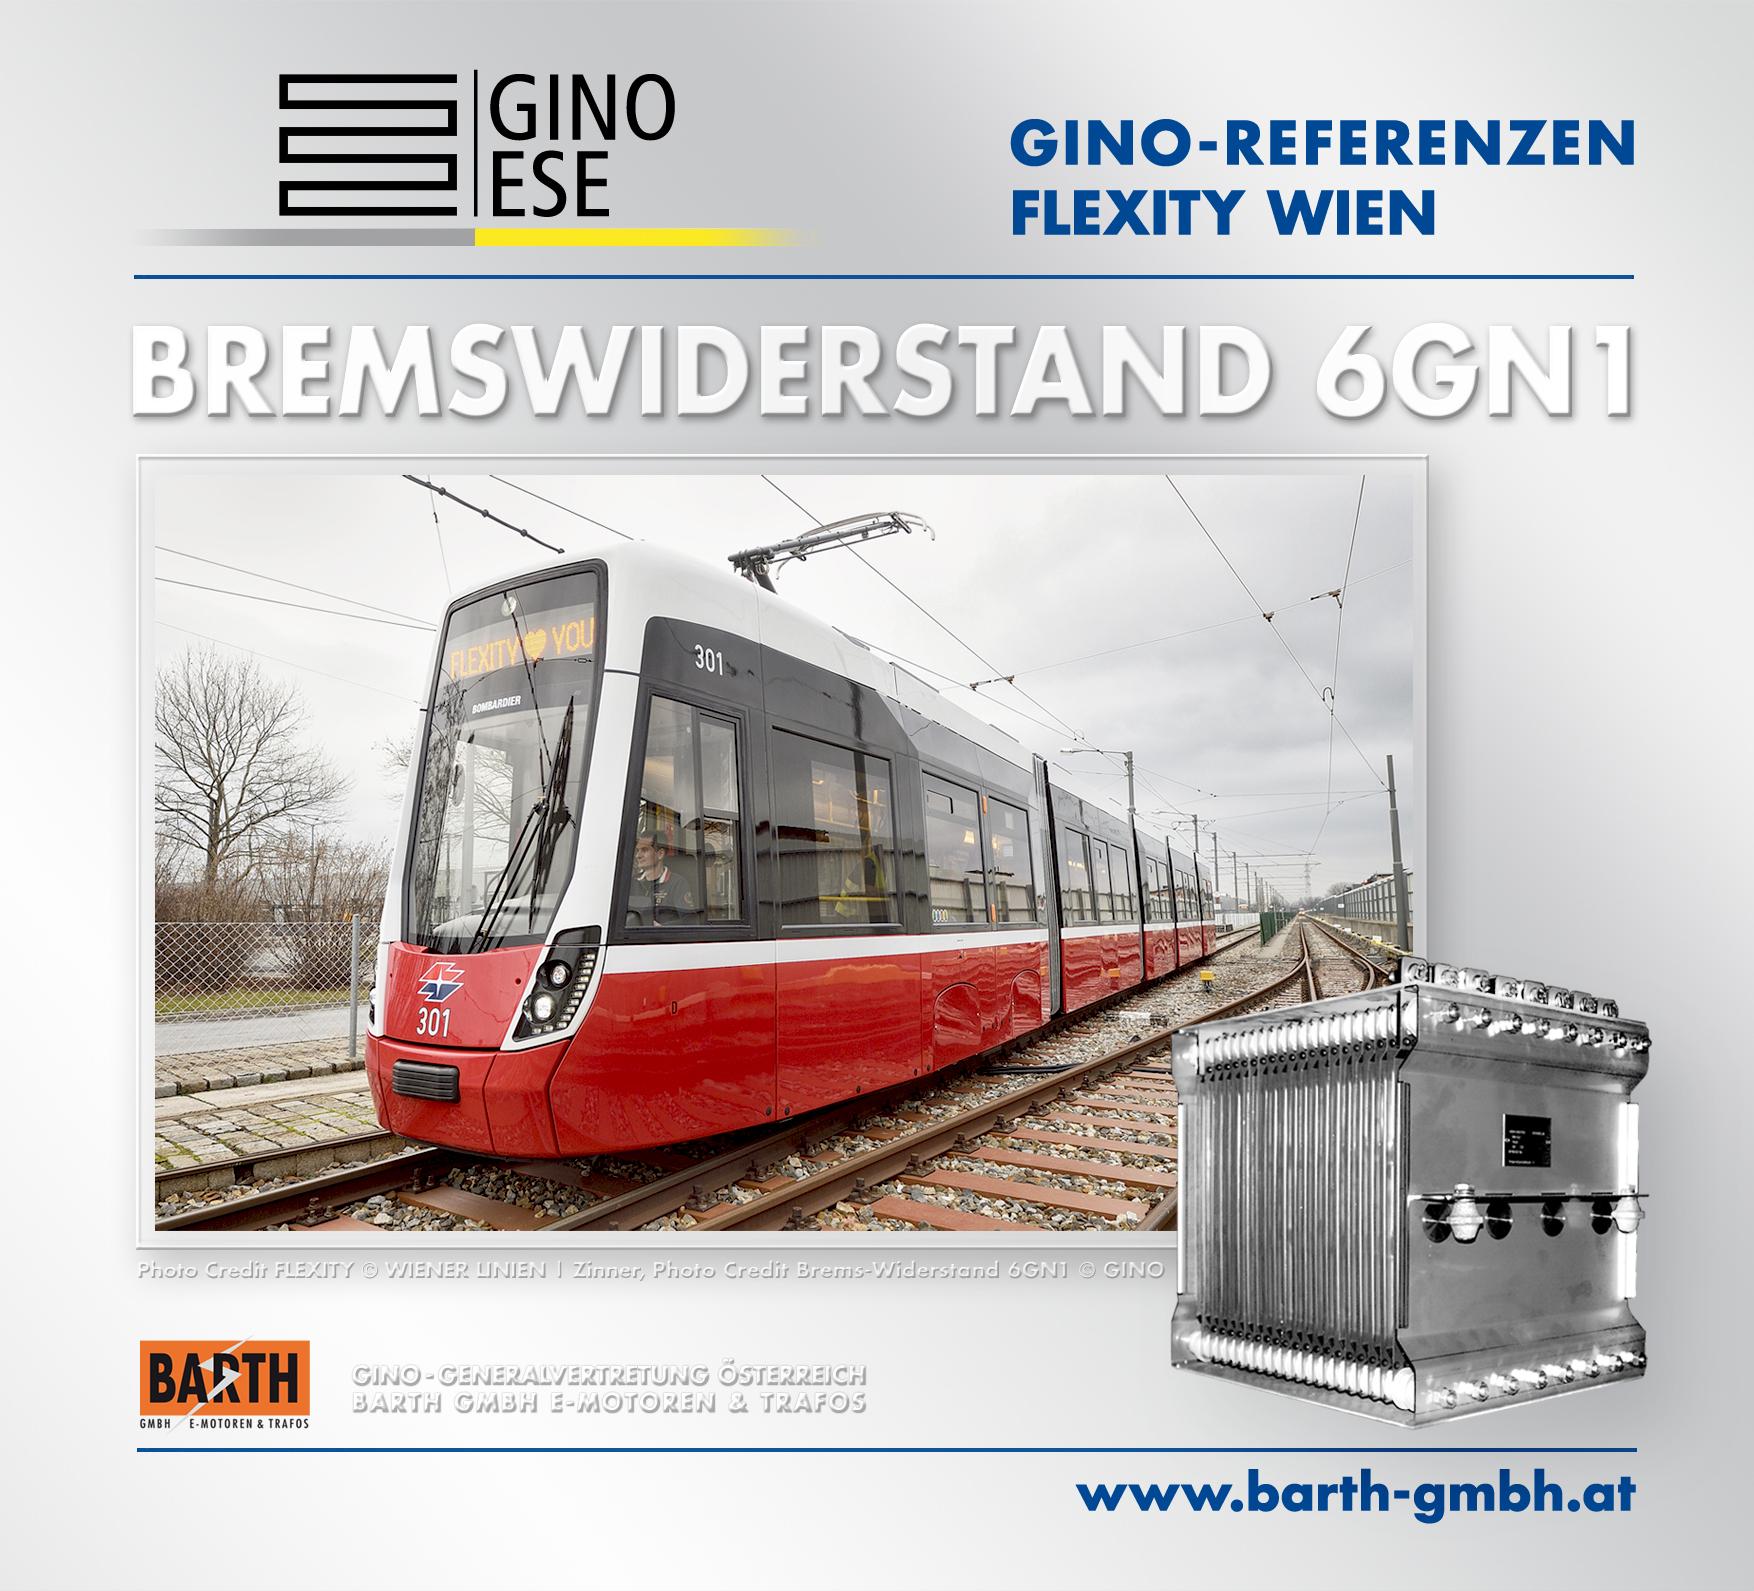 Foto: FLEXITY-Straßenbahn © Wiener Linien | Zinner / Foto: Brems-Widerstand 6GN1 © GINO AG